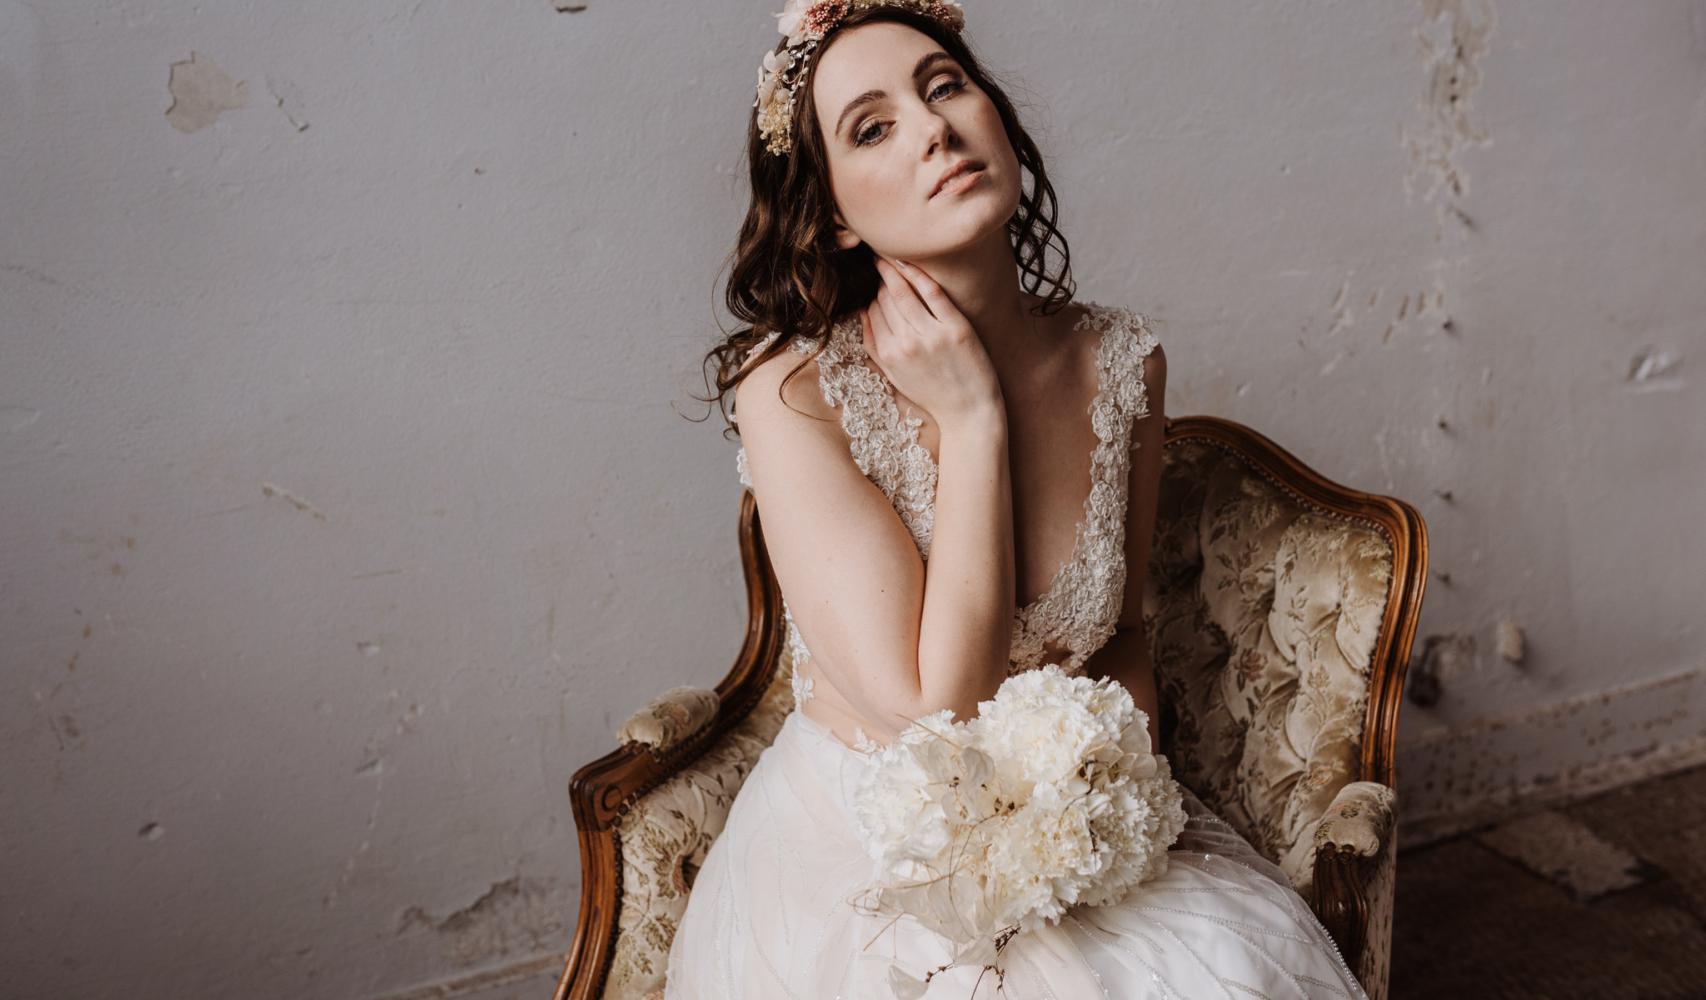 Bridal Editorial_ThuTrinh Photography 1